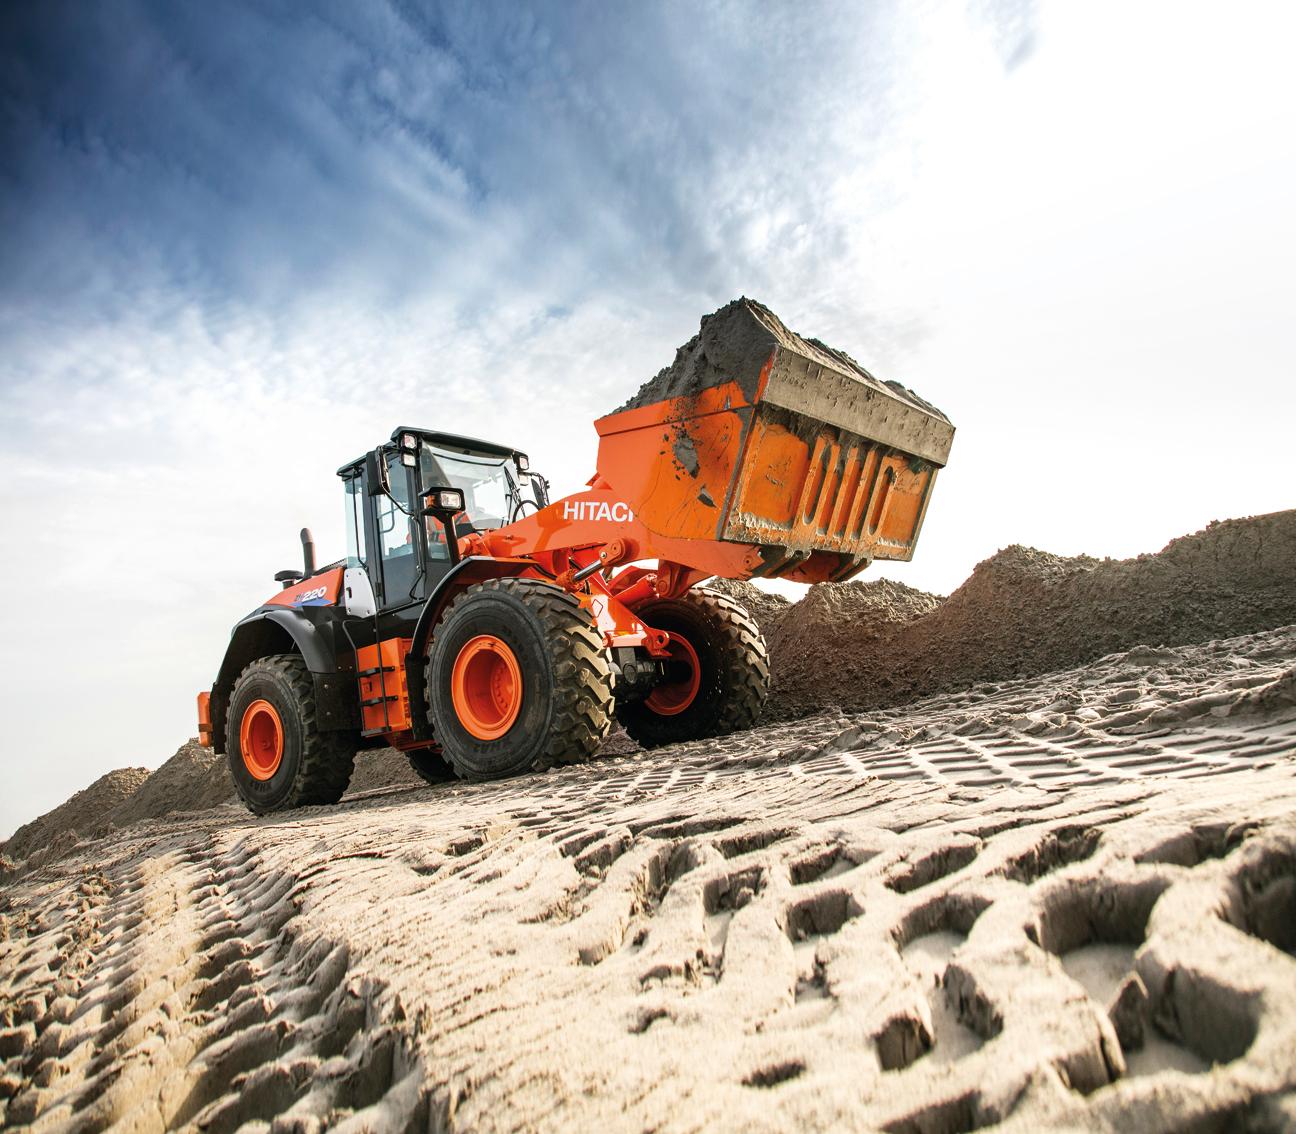 Hitachi ZW220-6 wheel loader dirt